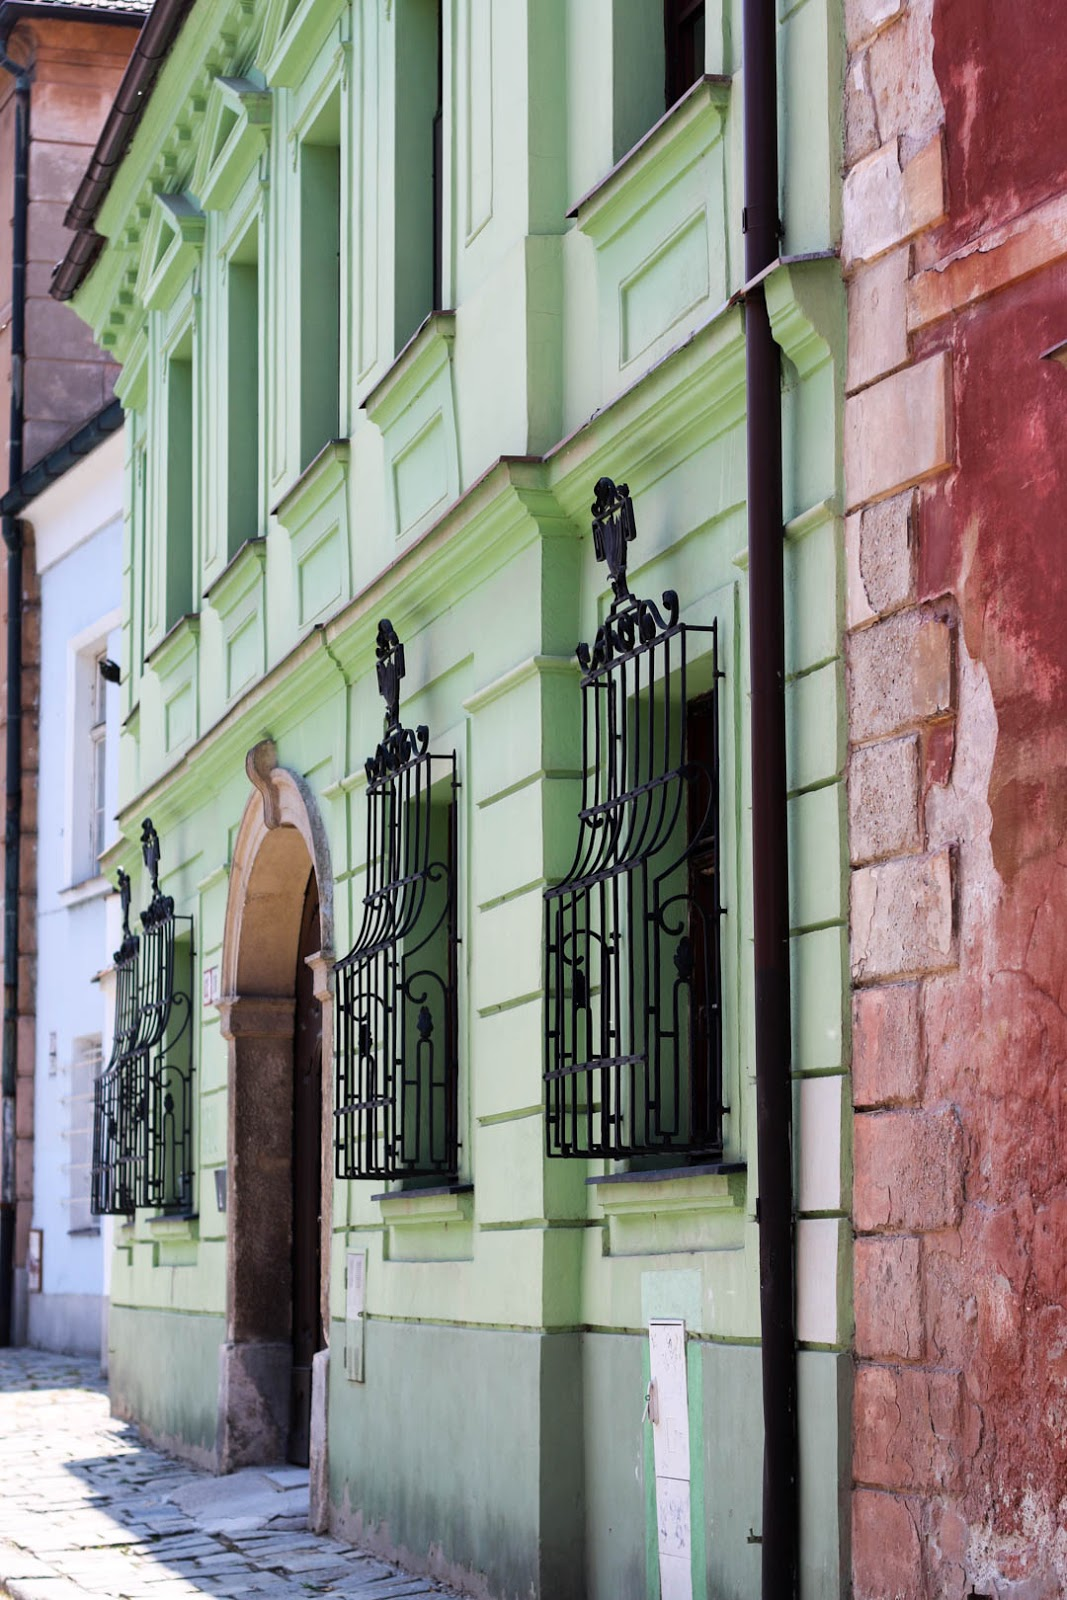 Wien, Vienna, Bratislava, Fleurcoquet